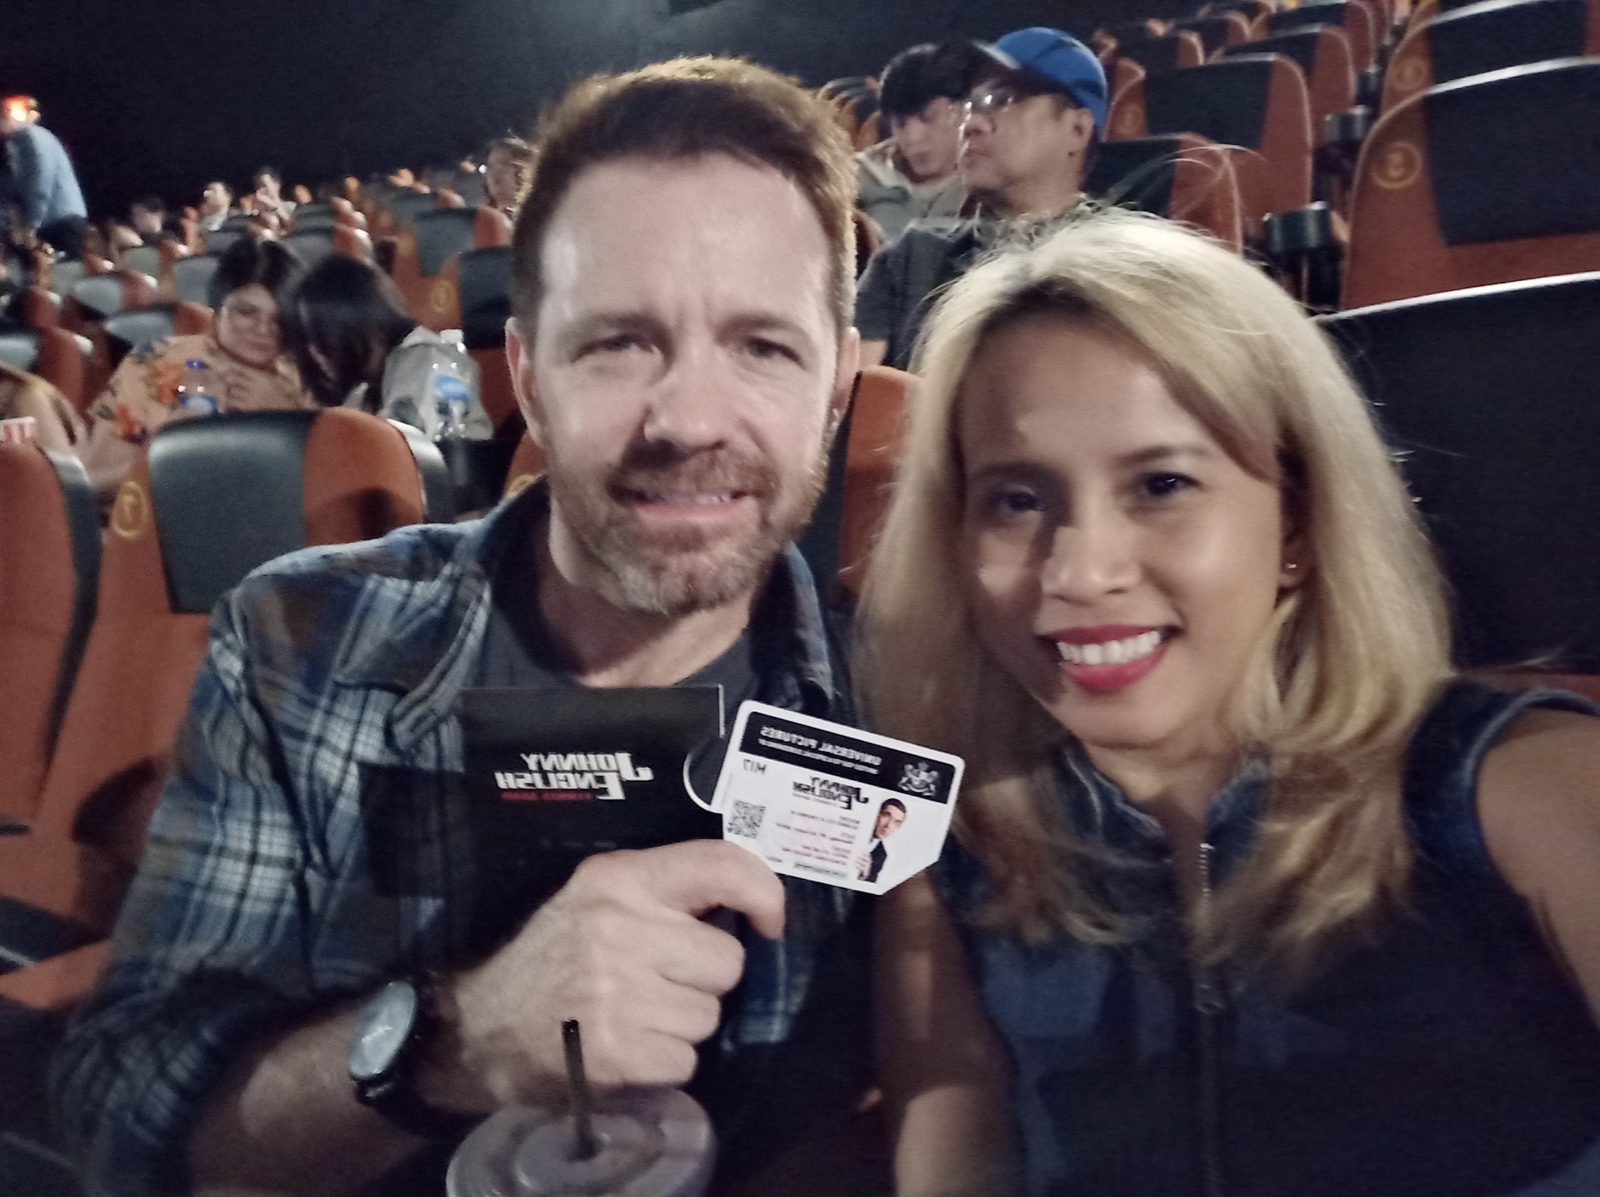 Johnny English Strikes Back movie review